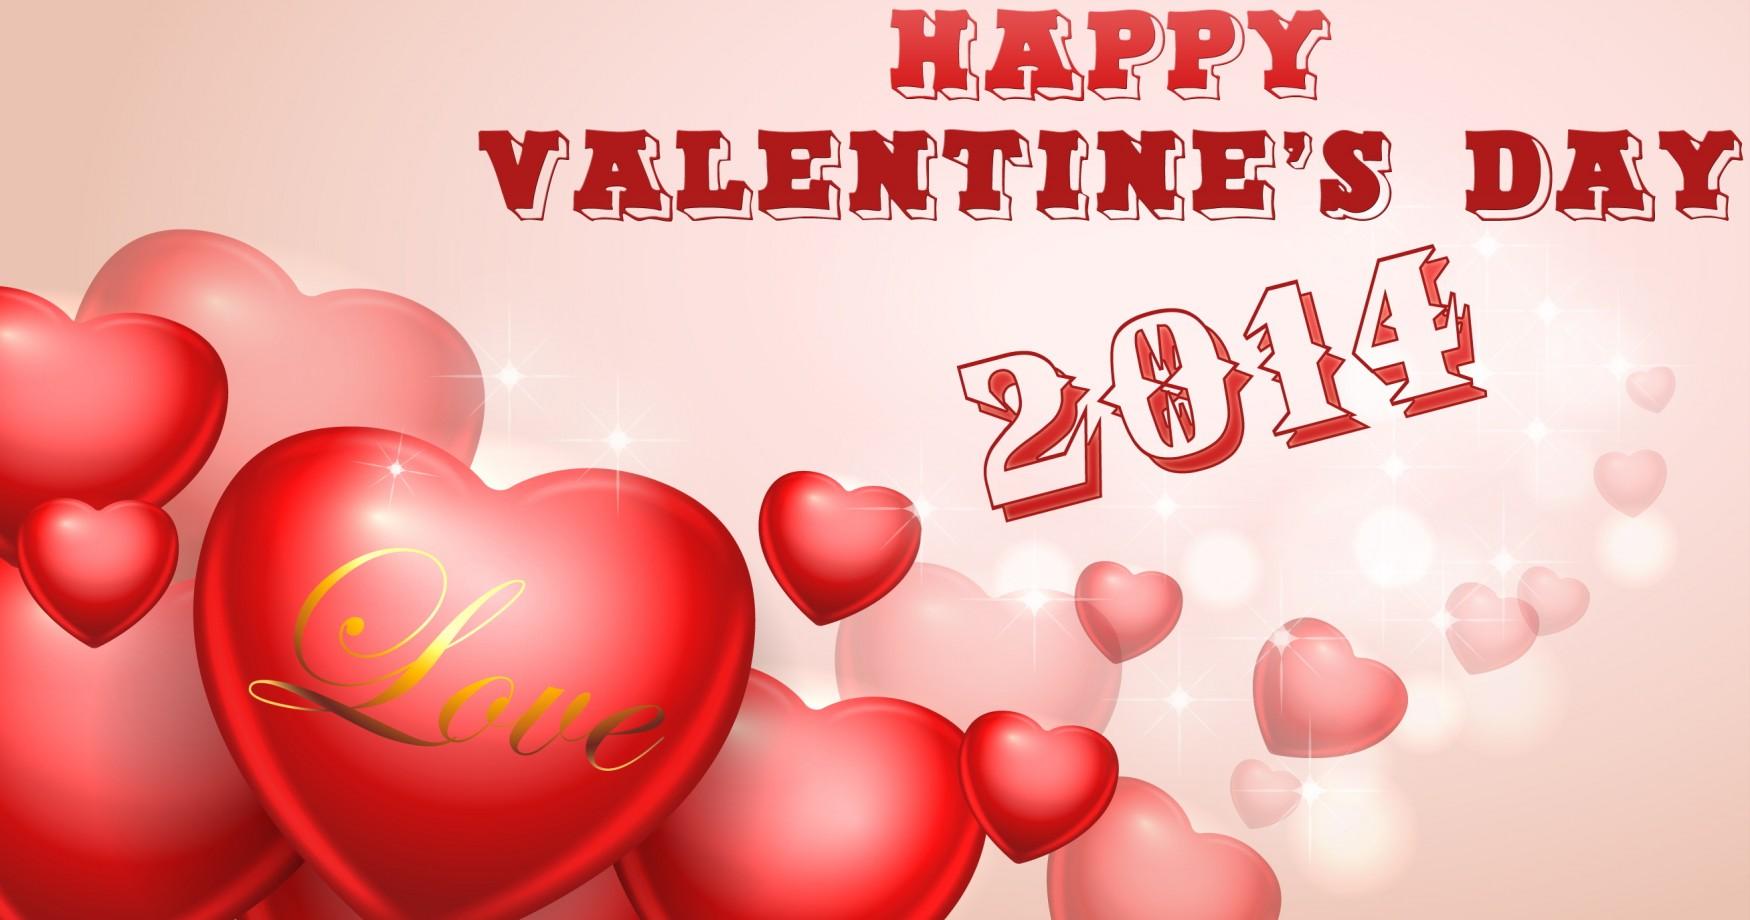 Valentines Day 2018  Happy Valentines Day 2018 Quotes